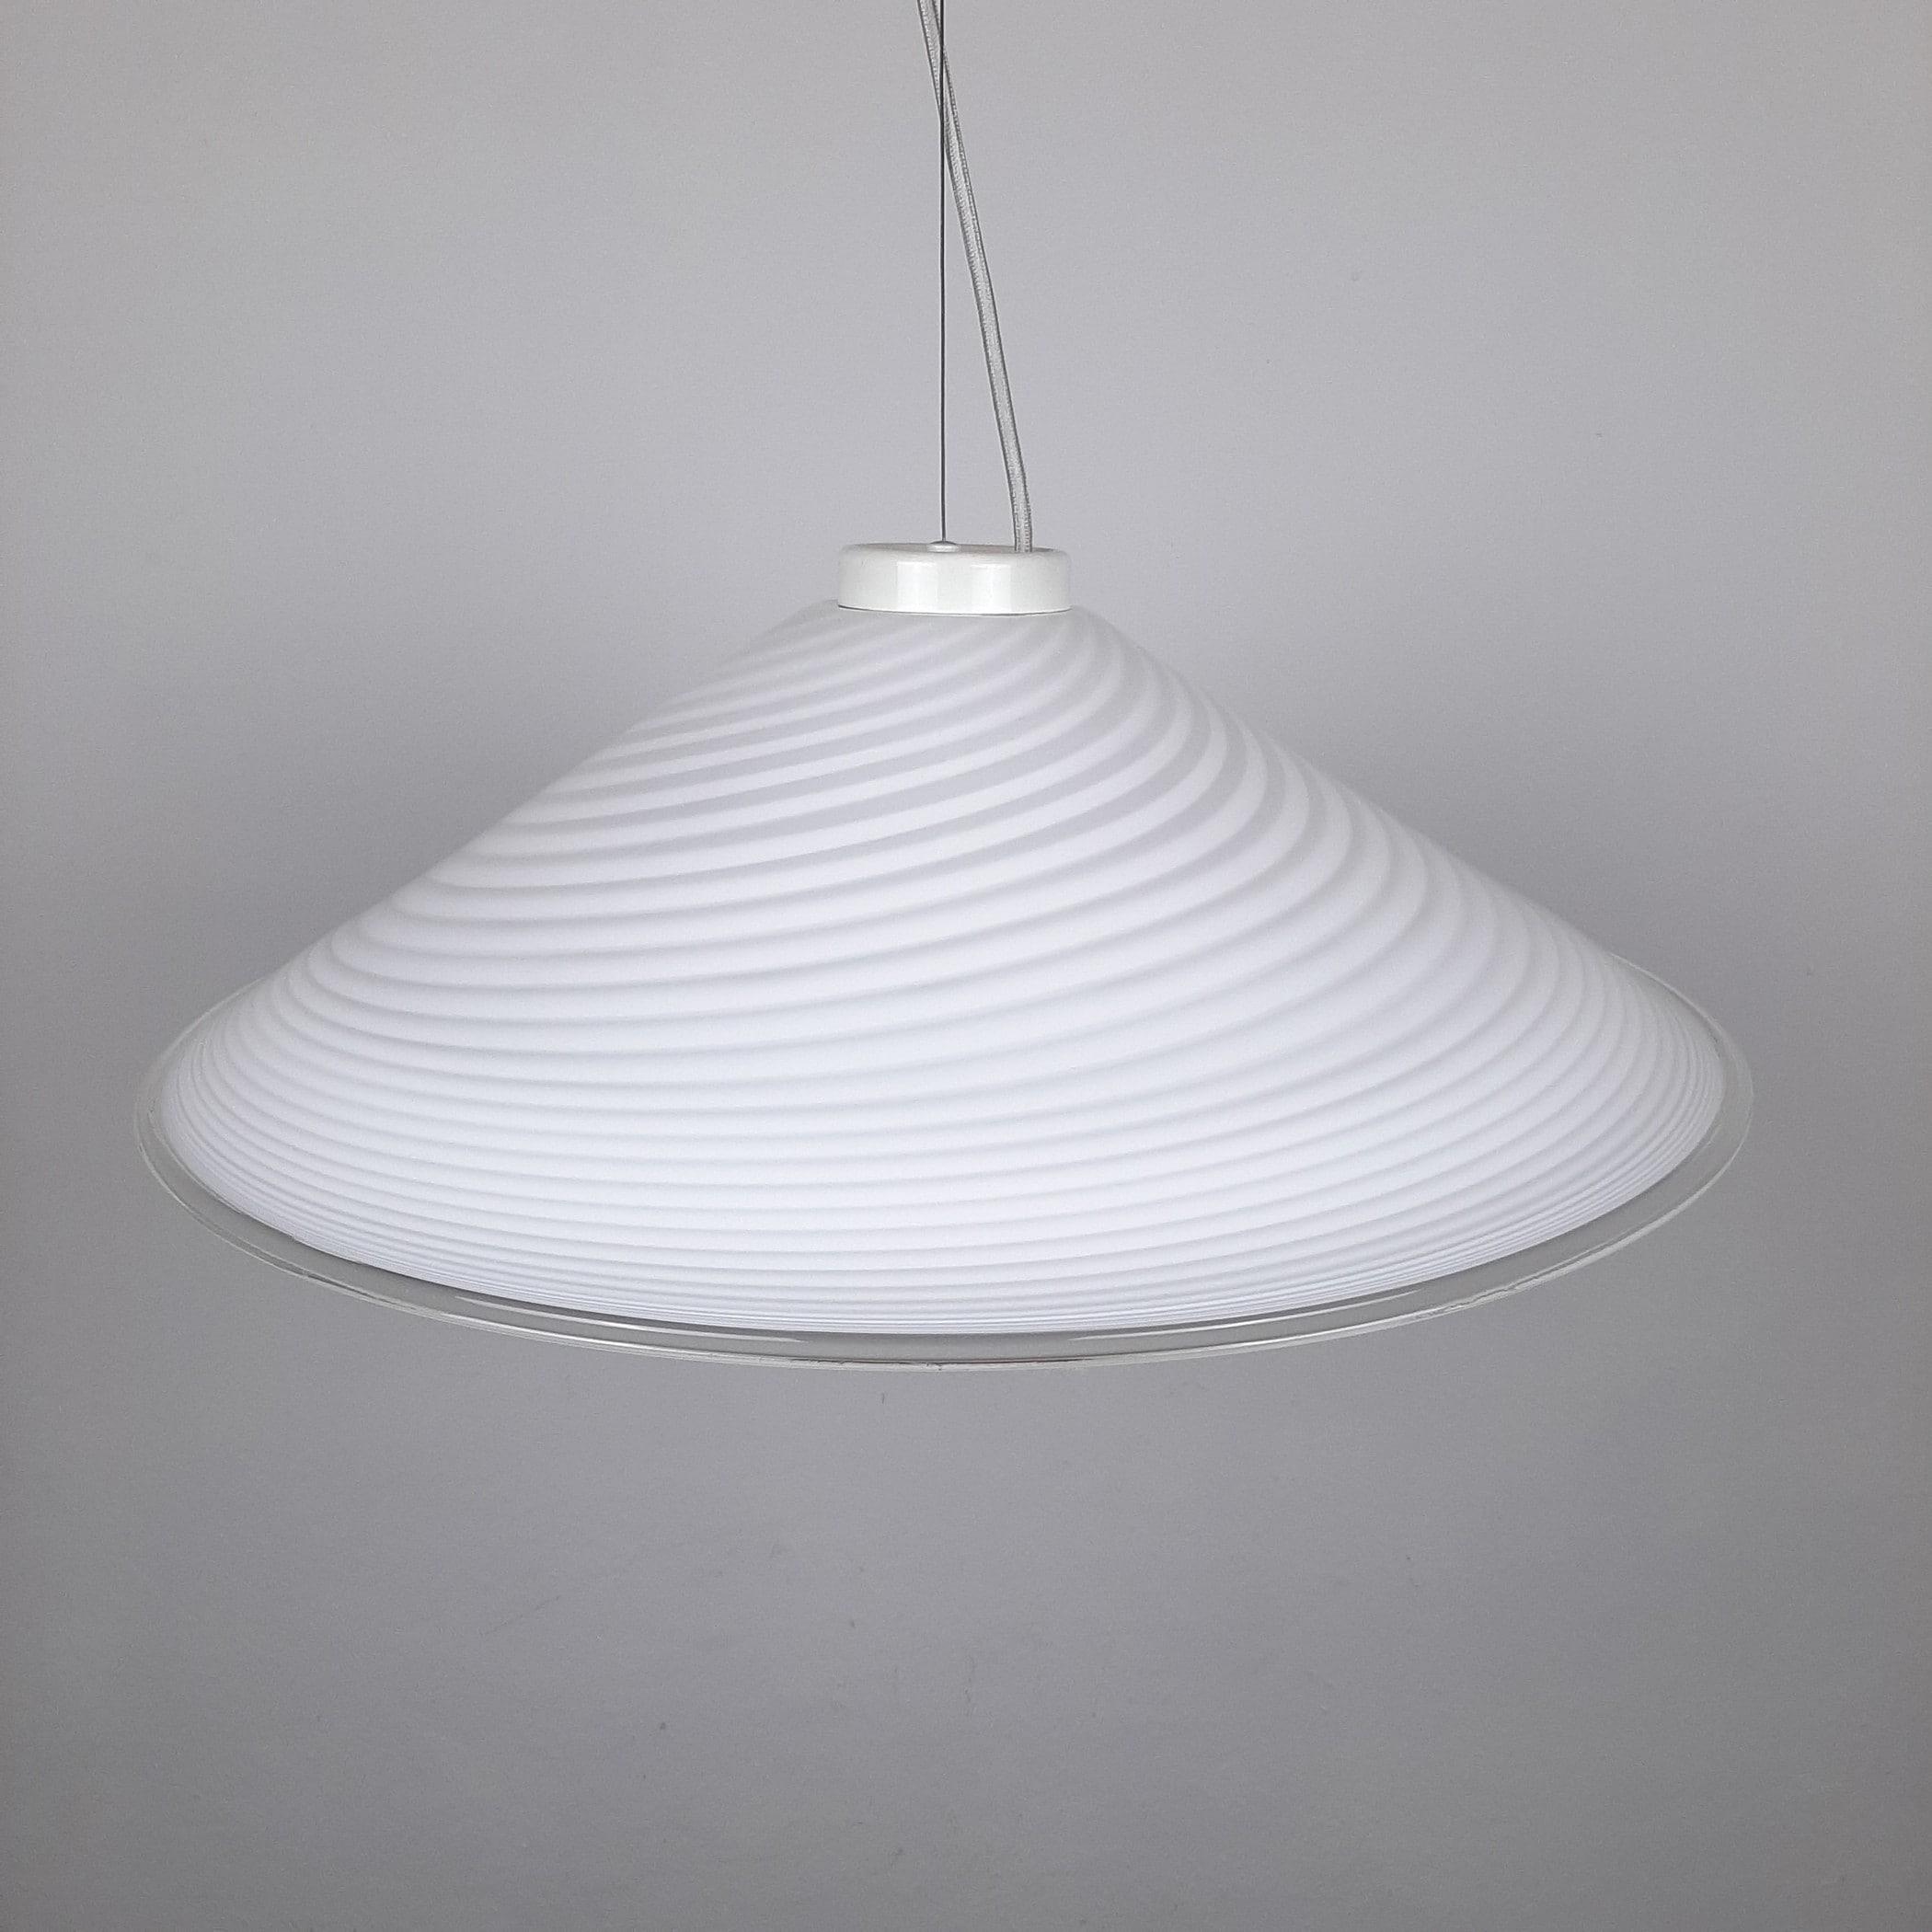 Retro swirl murano glass pendant lamp Italy 1970s Mid-century light